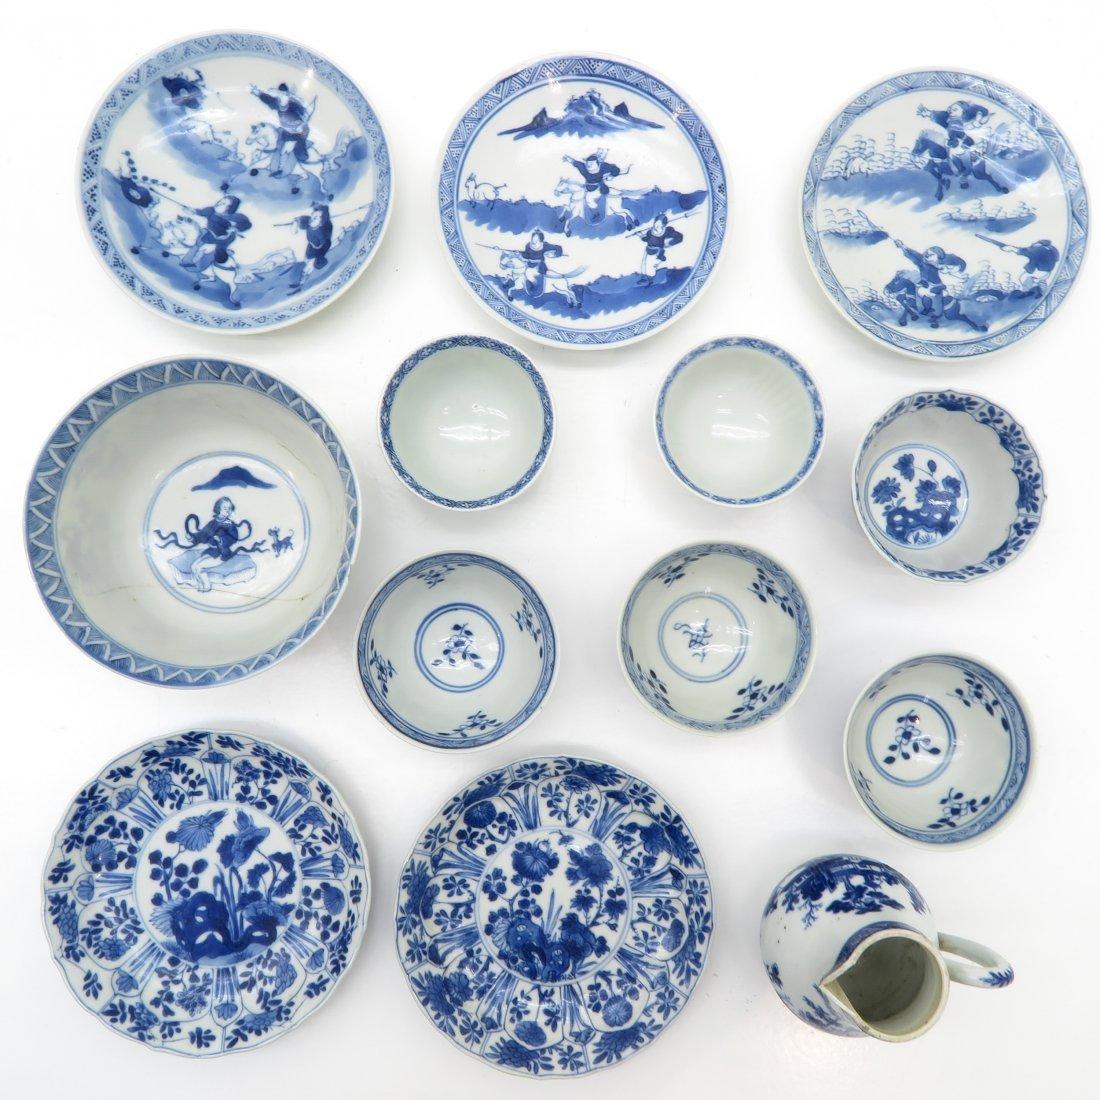 Diverse Lot of China Porcelain - 2